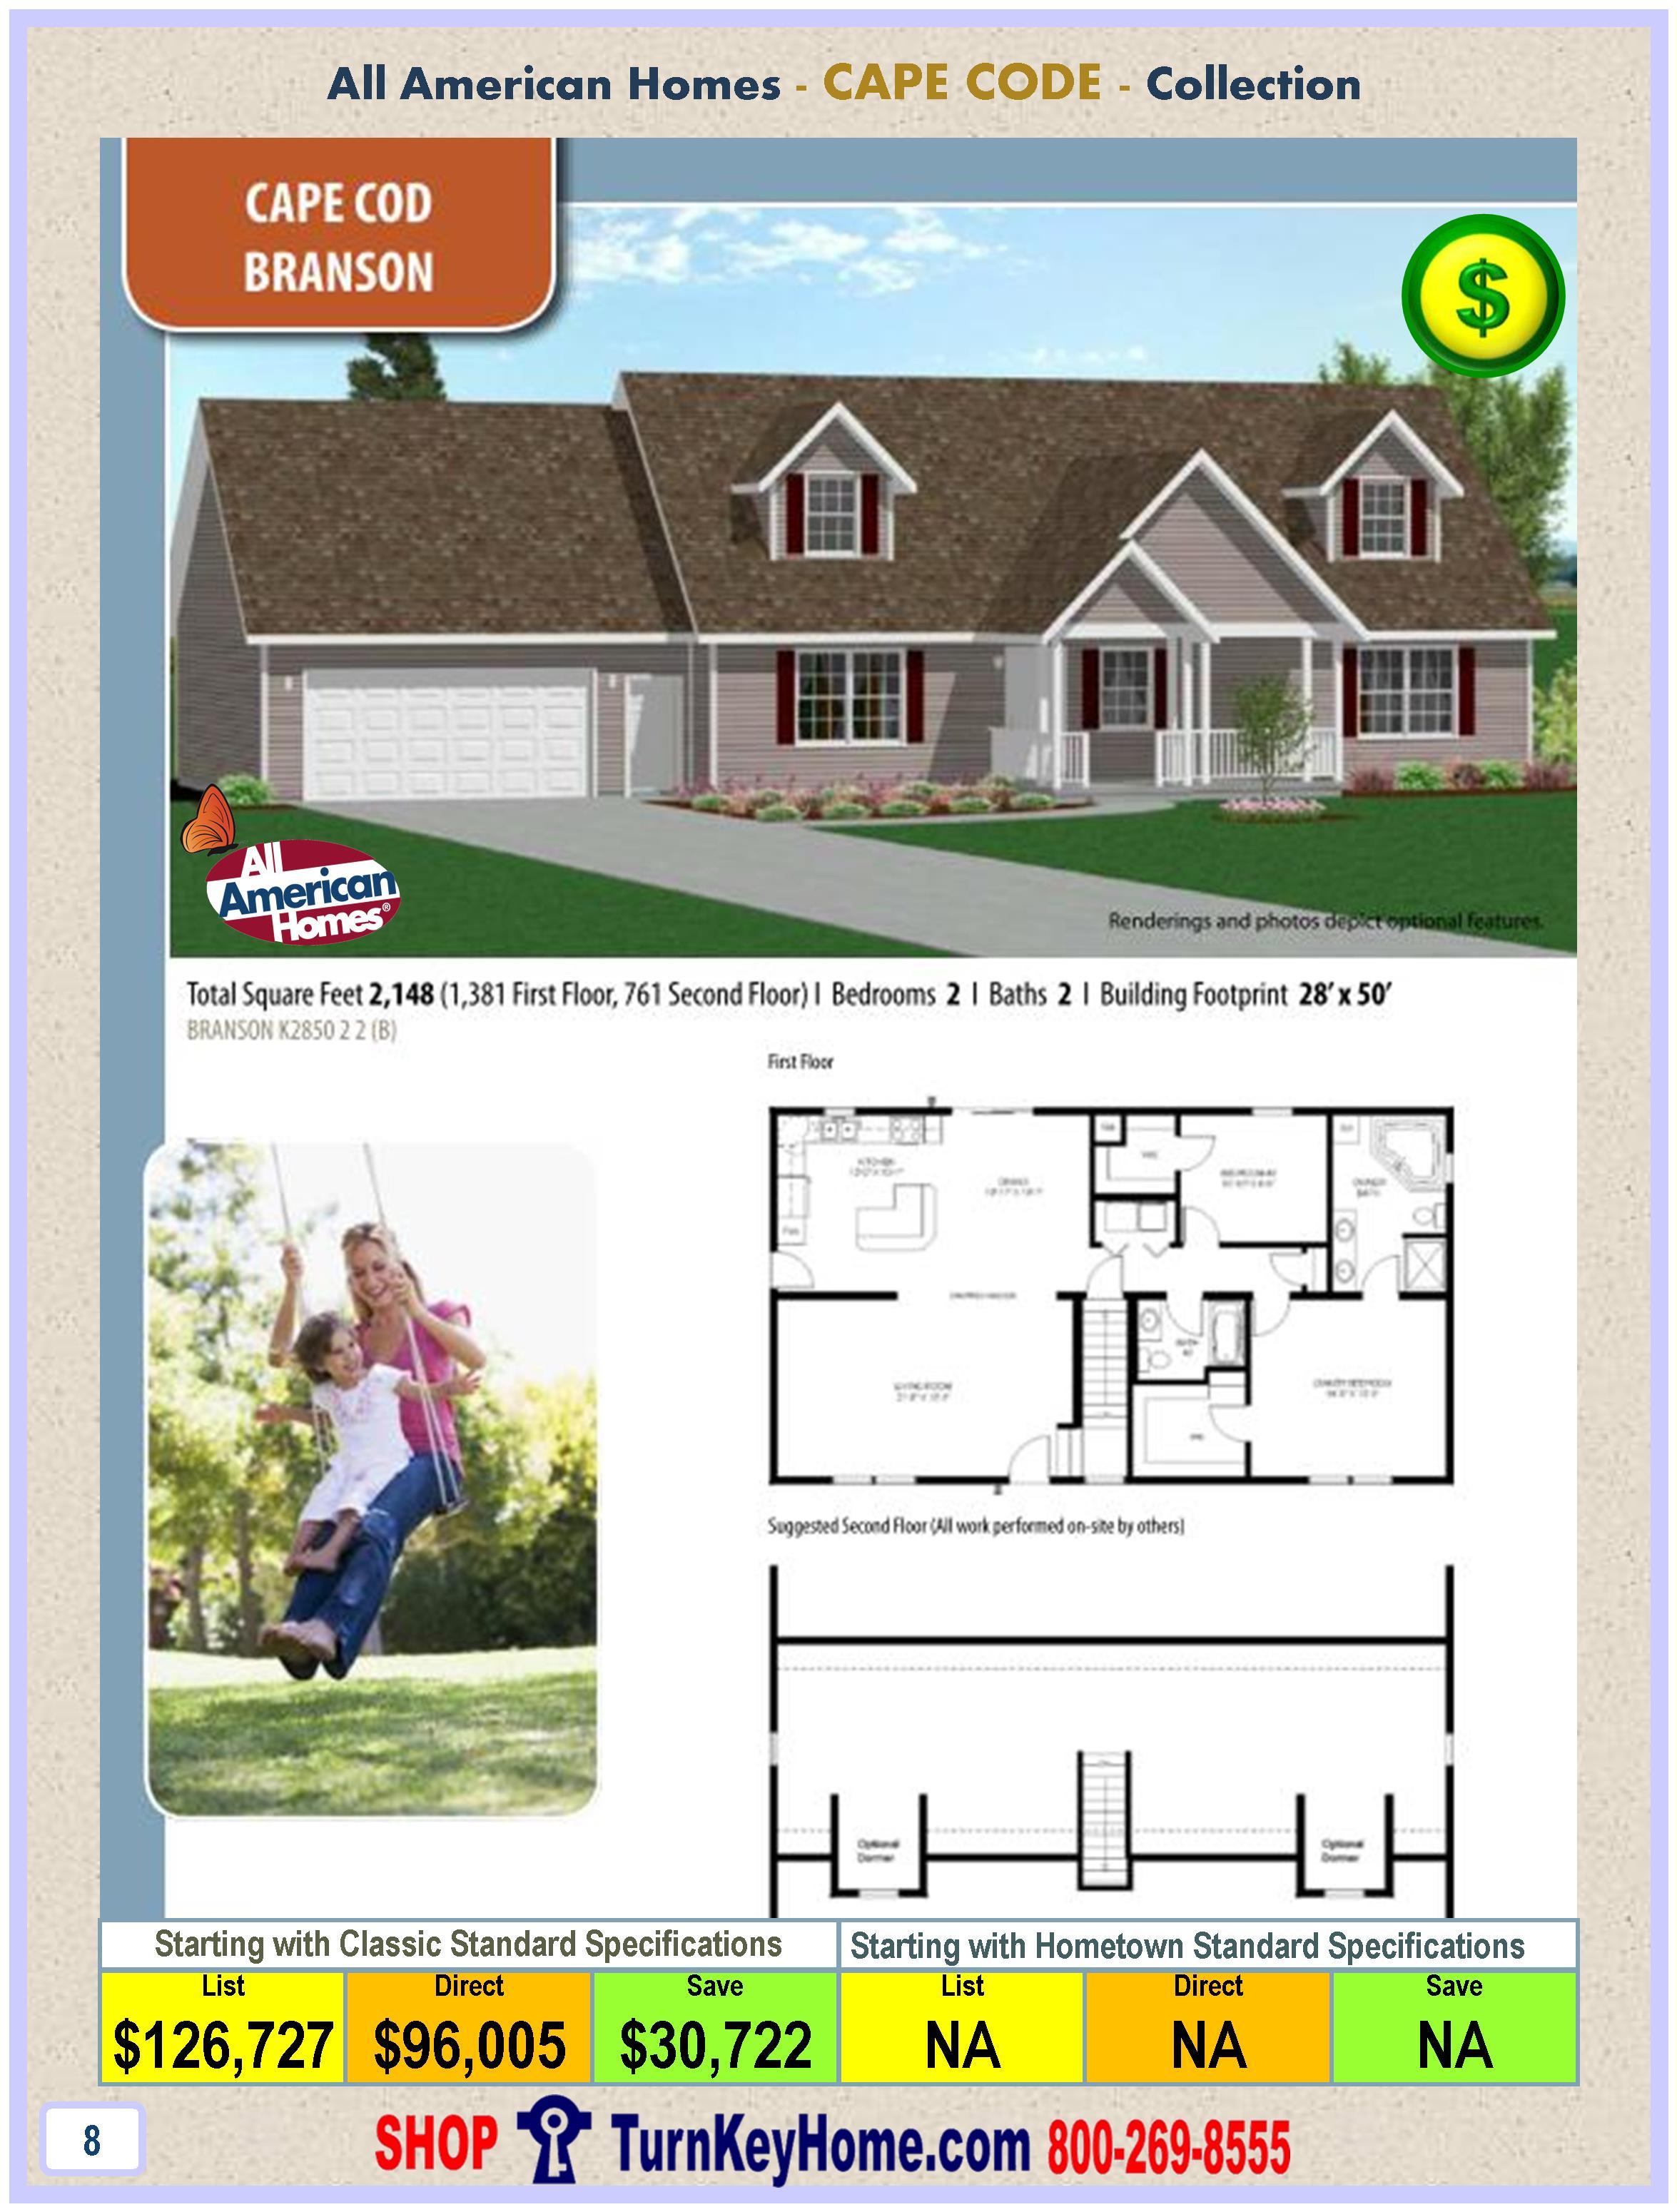 Modular.Home.All.American.Homes.Cape.Cod.BRANSON.Plan.Price.P8.11.28.15